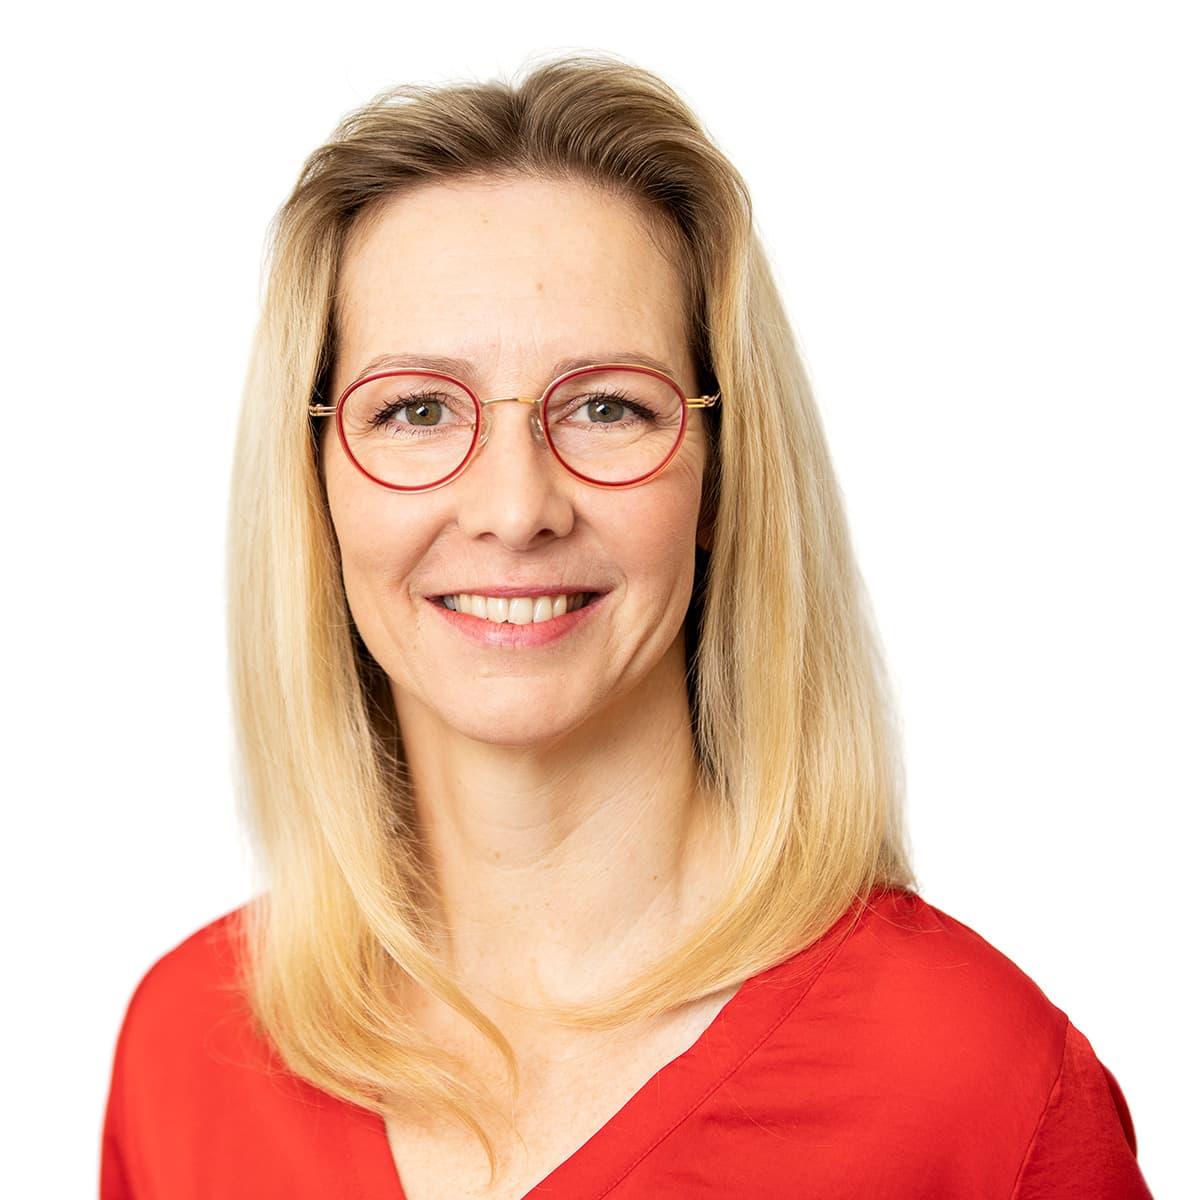 Ulrike Kalipke, Augenoptikerin